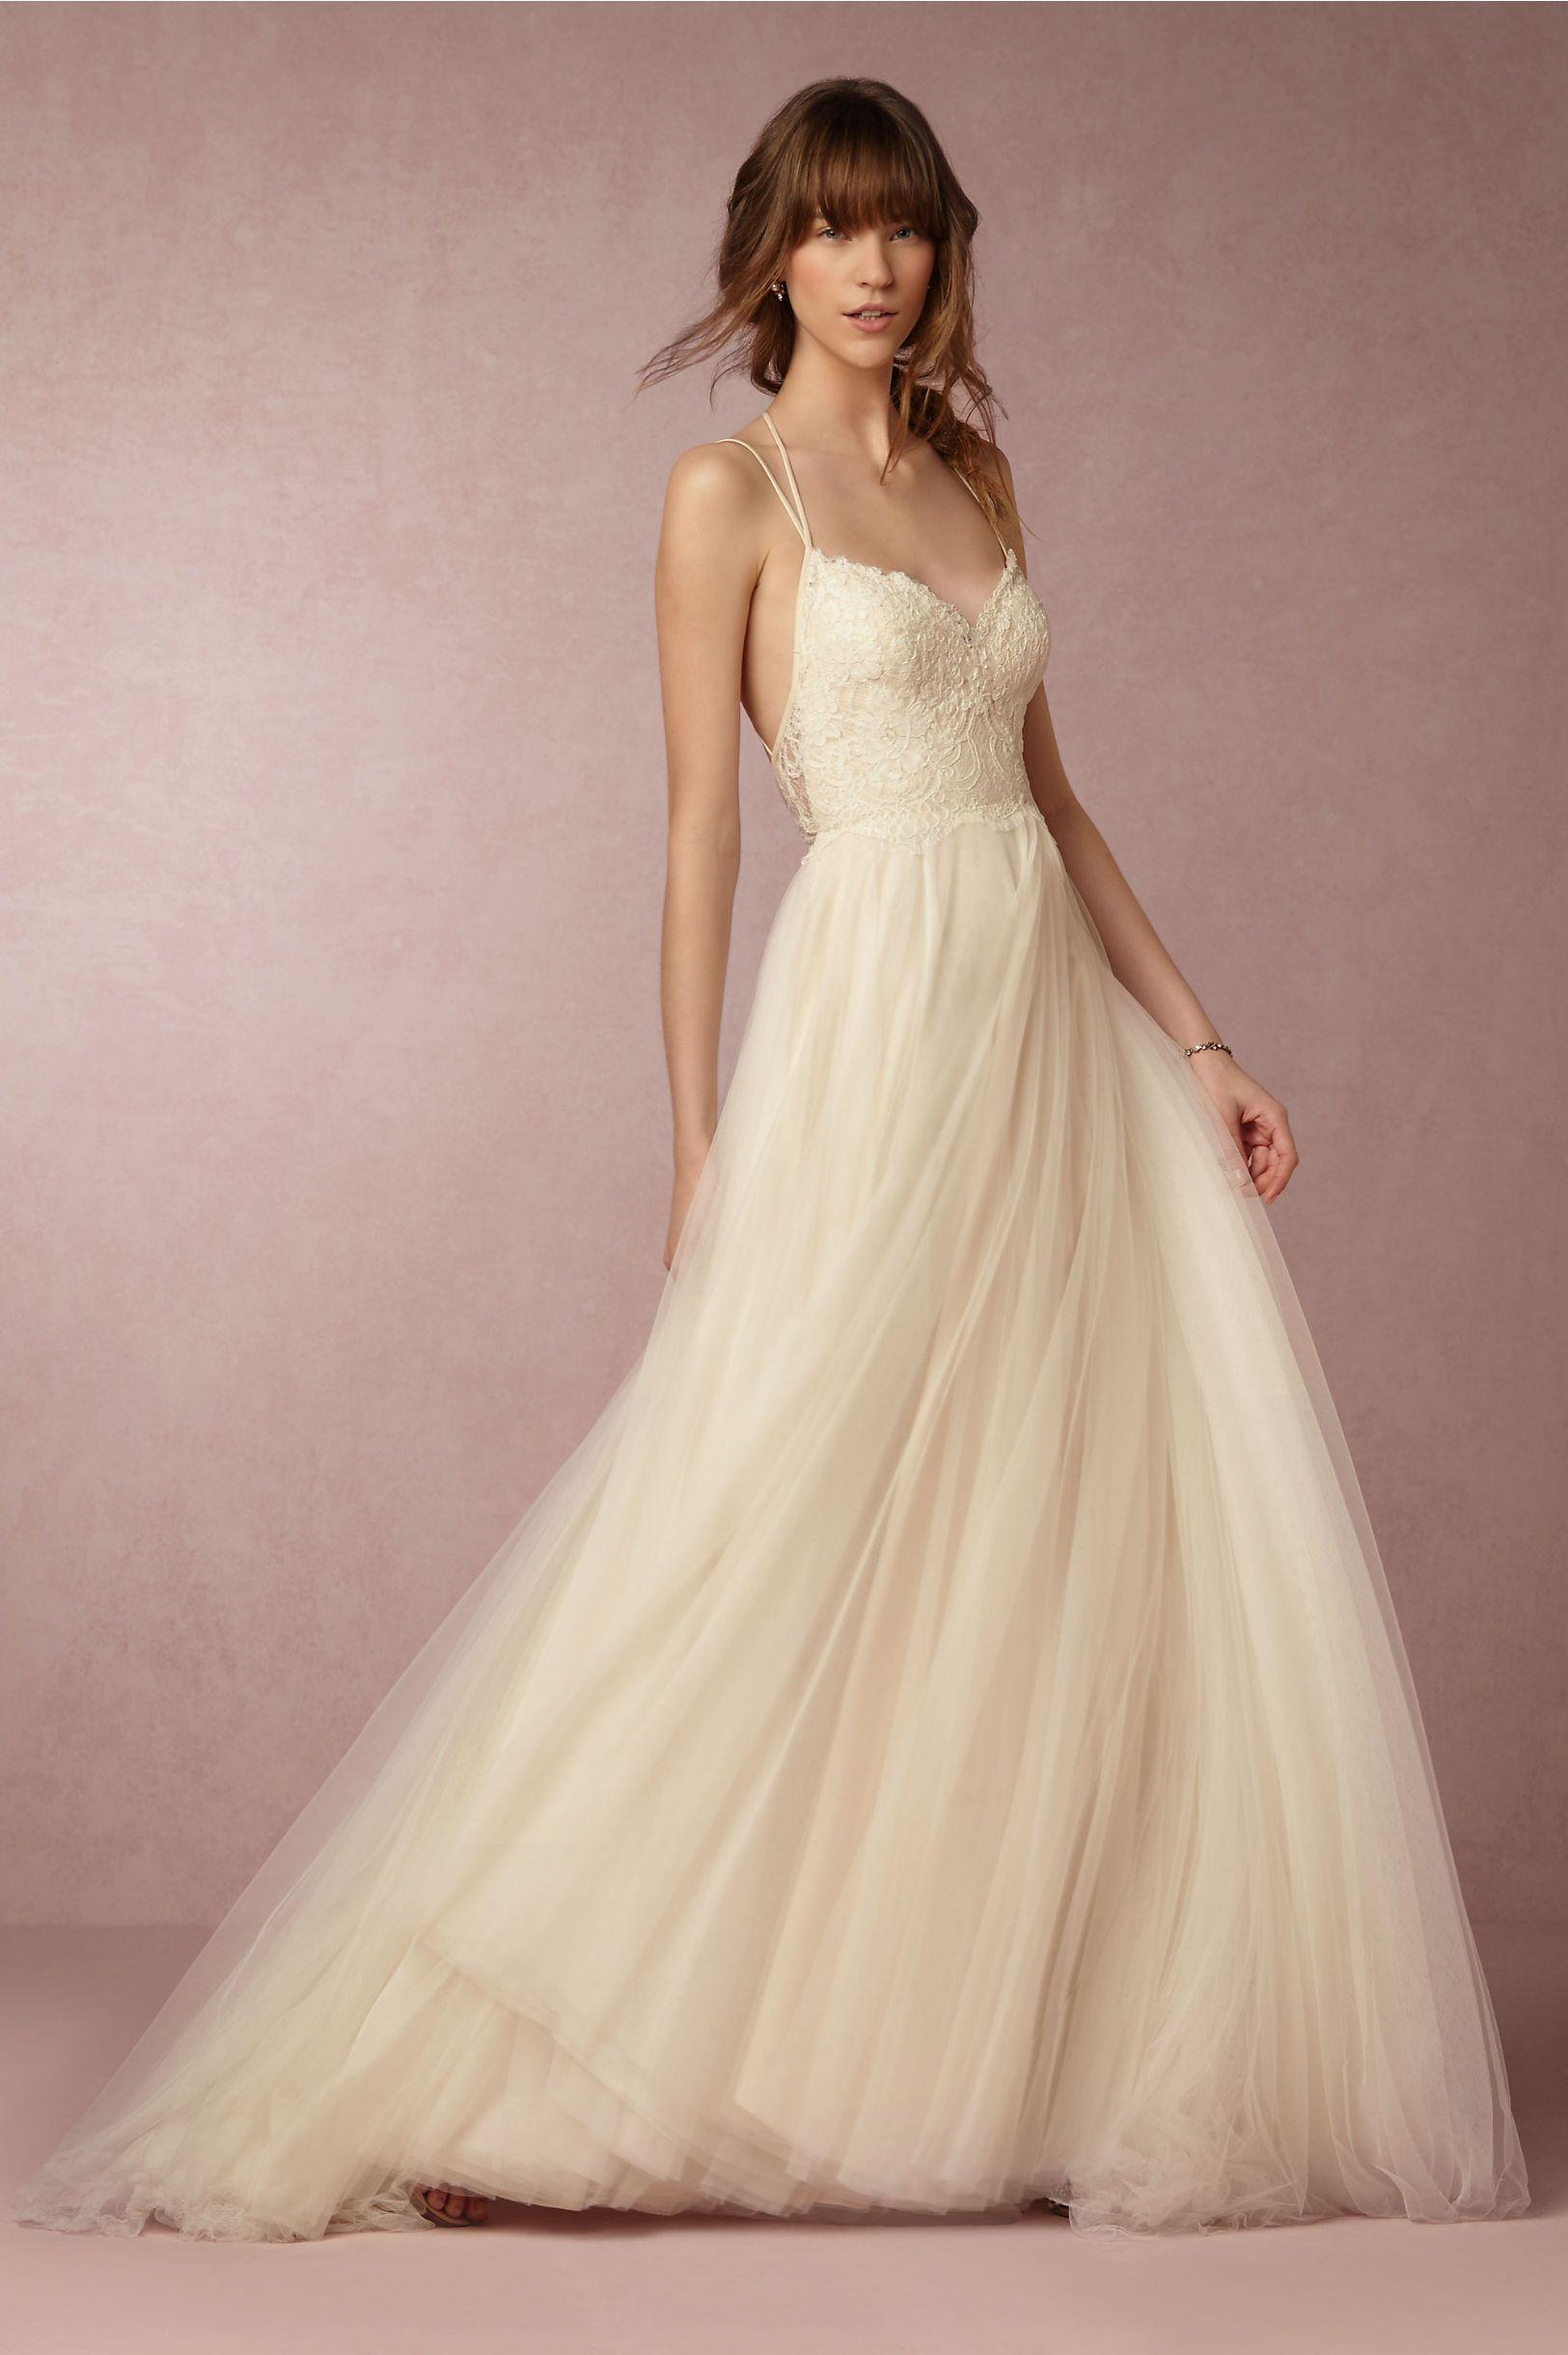 BHLDN Rosalind Gown in Bride Wedding Dresses at BHLDN | Wedding ...